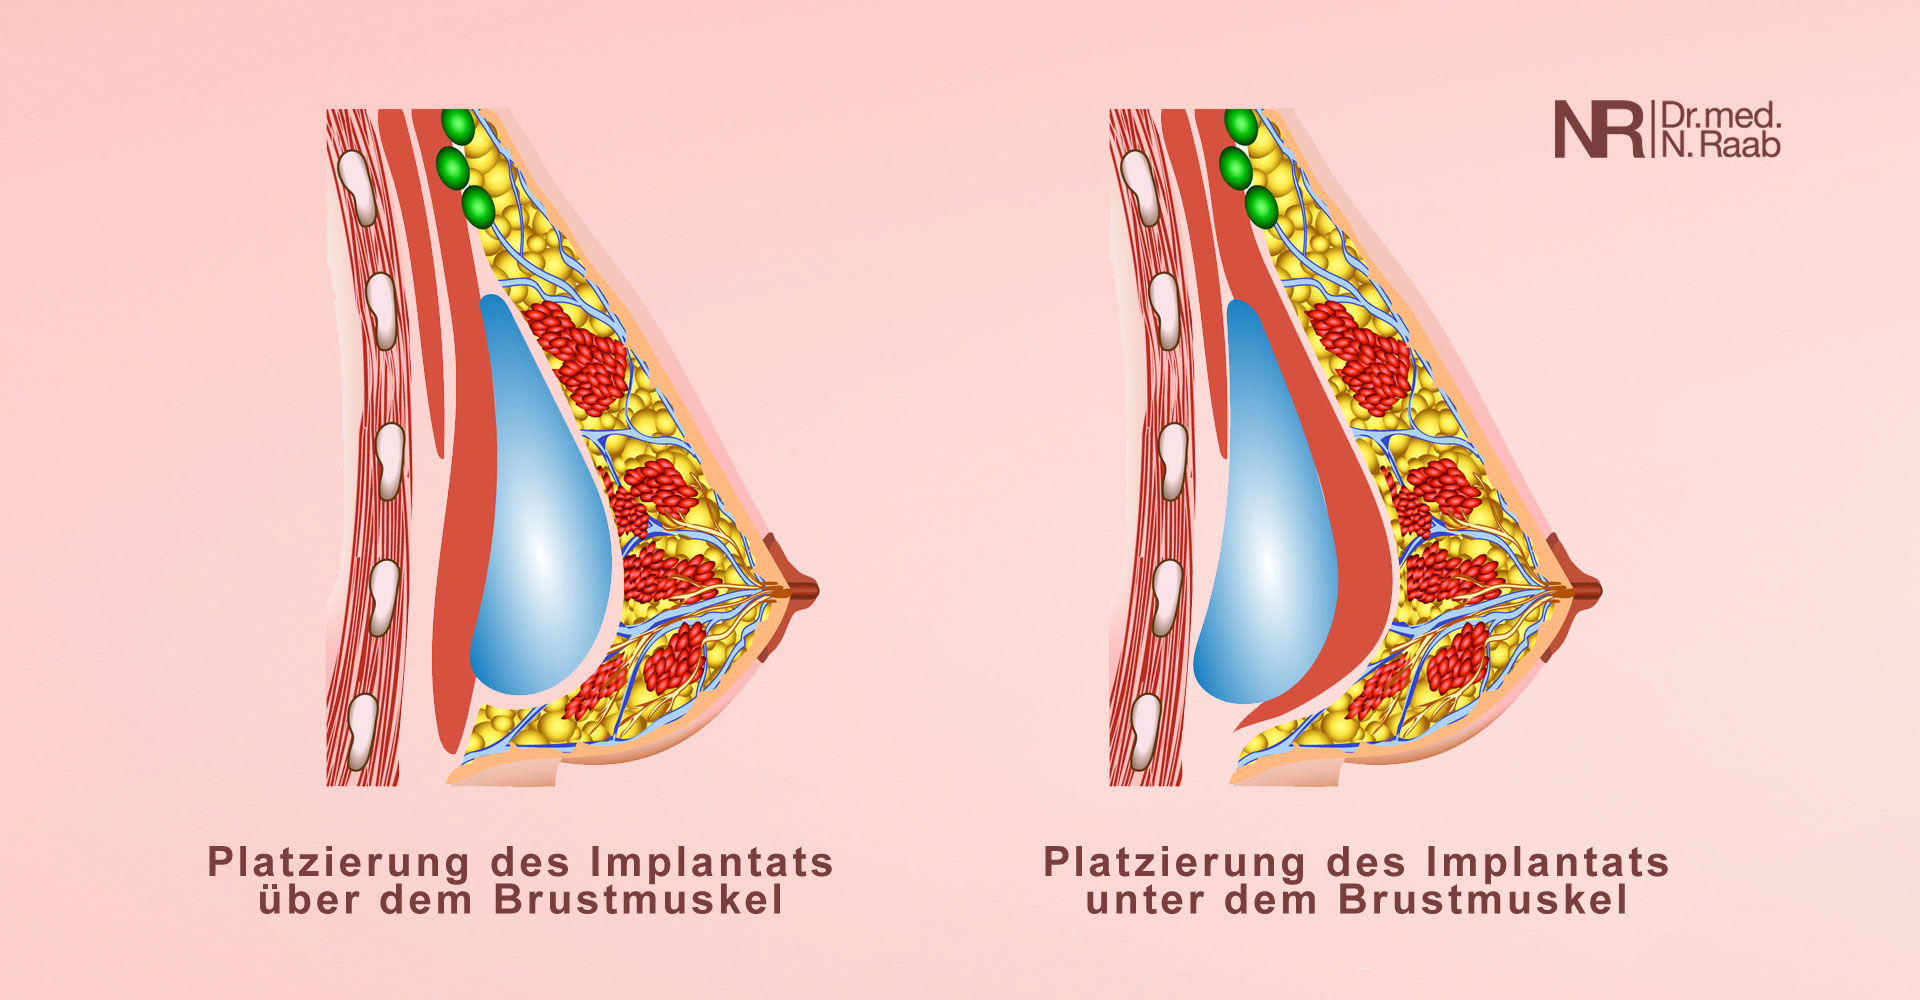 Brustvergrösserung - Implantatposition über oder unter dem Brustmuskel